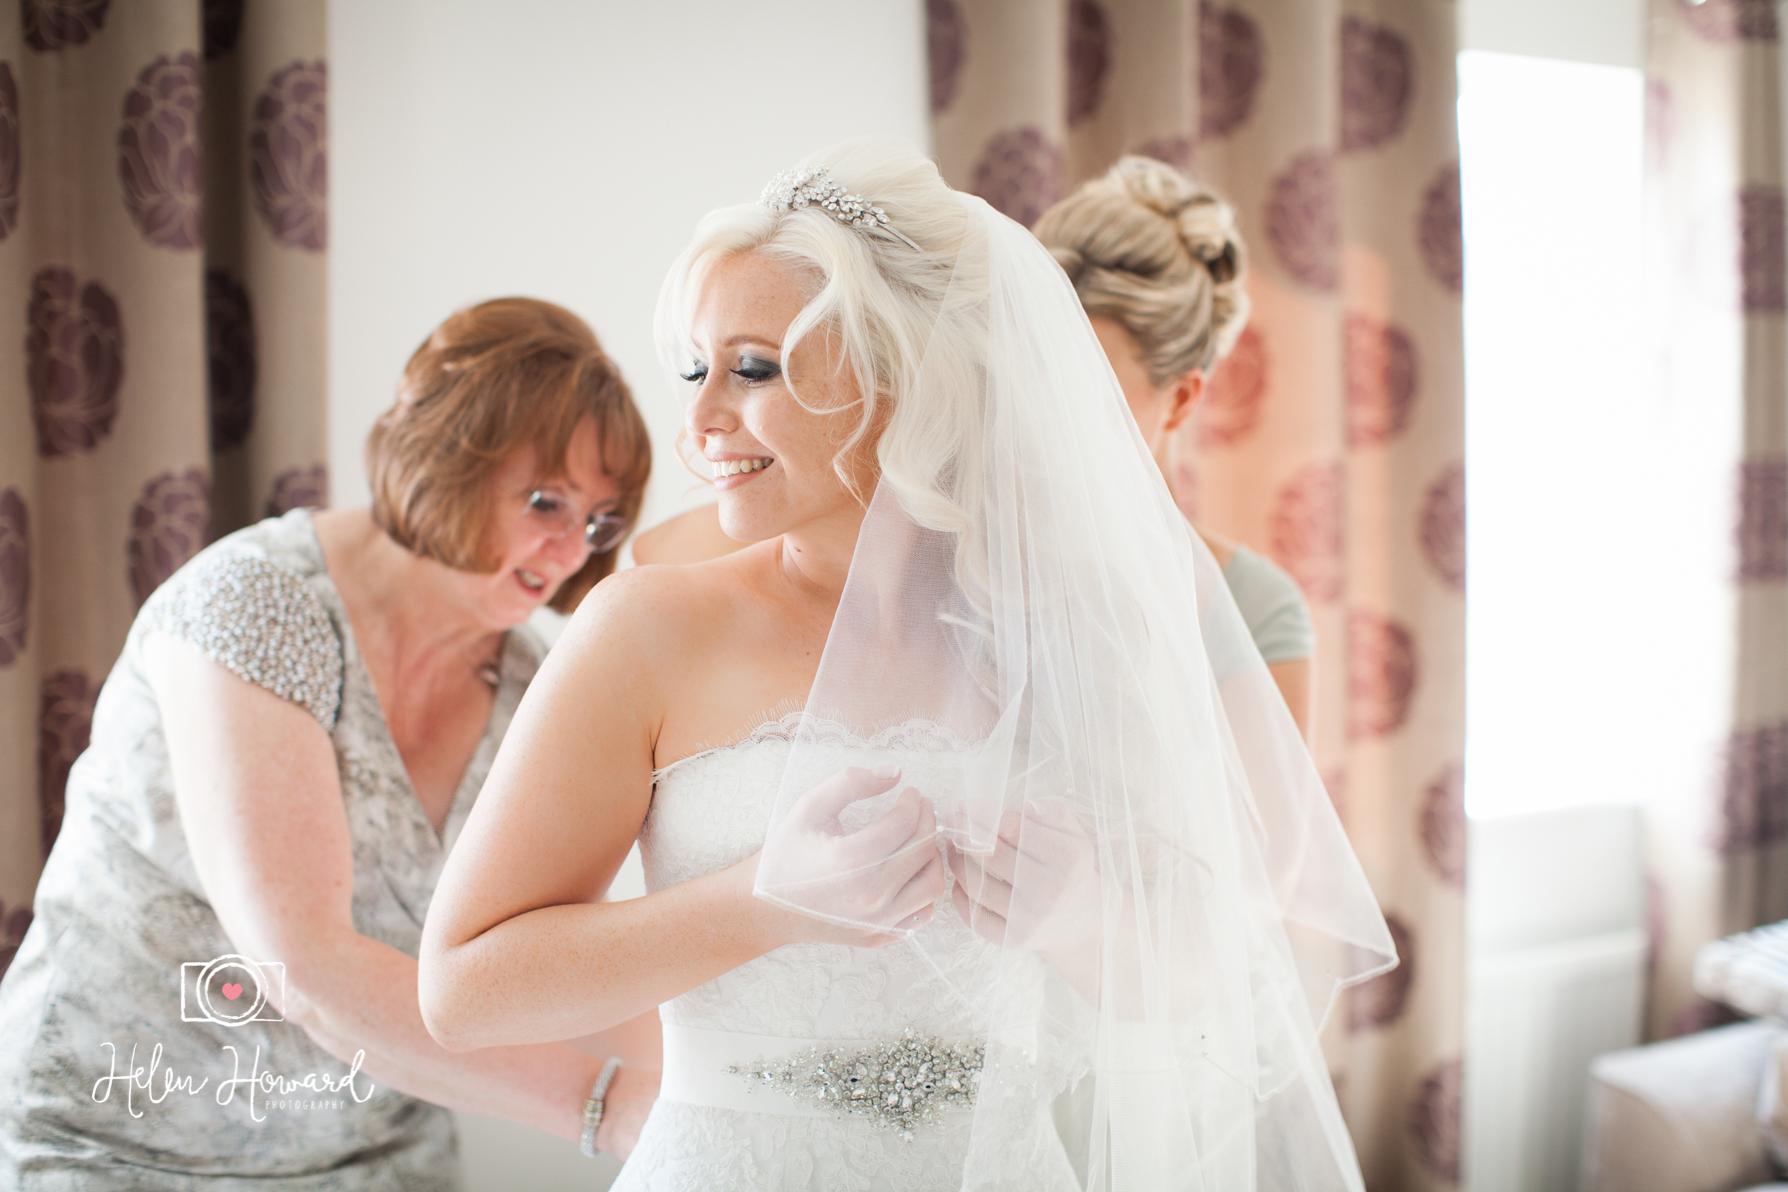 Bride Getting ready lichfield wedding photographer